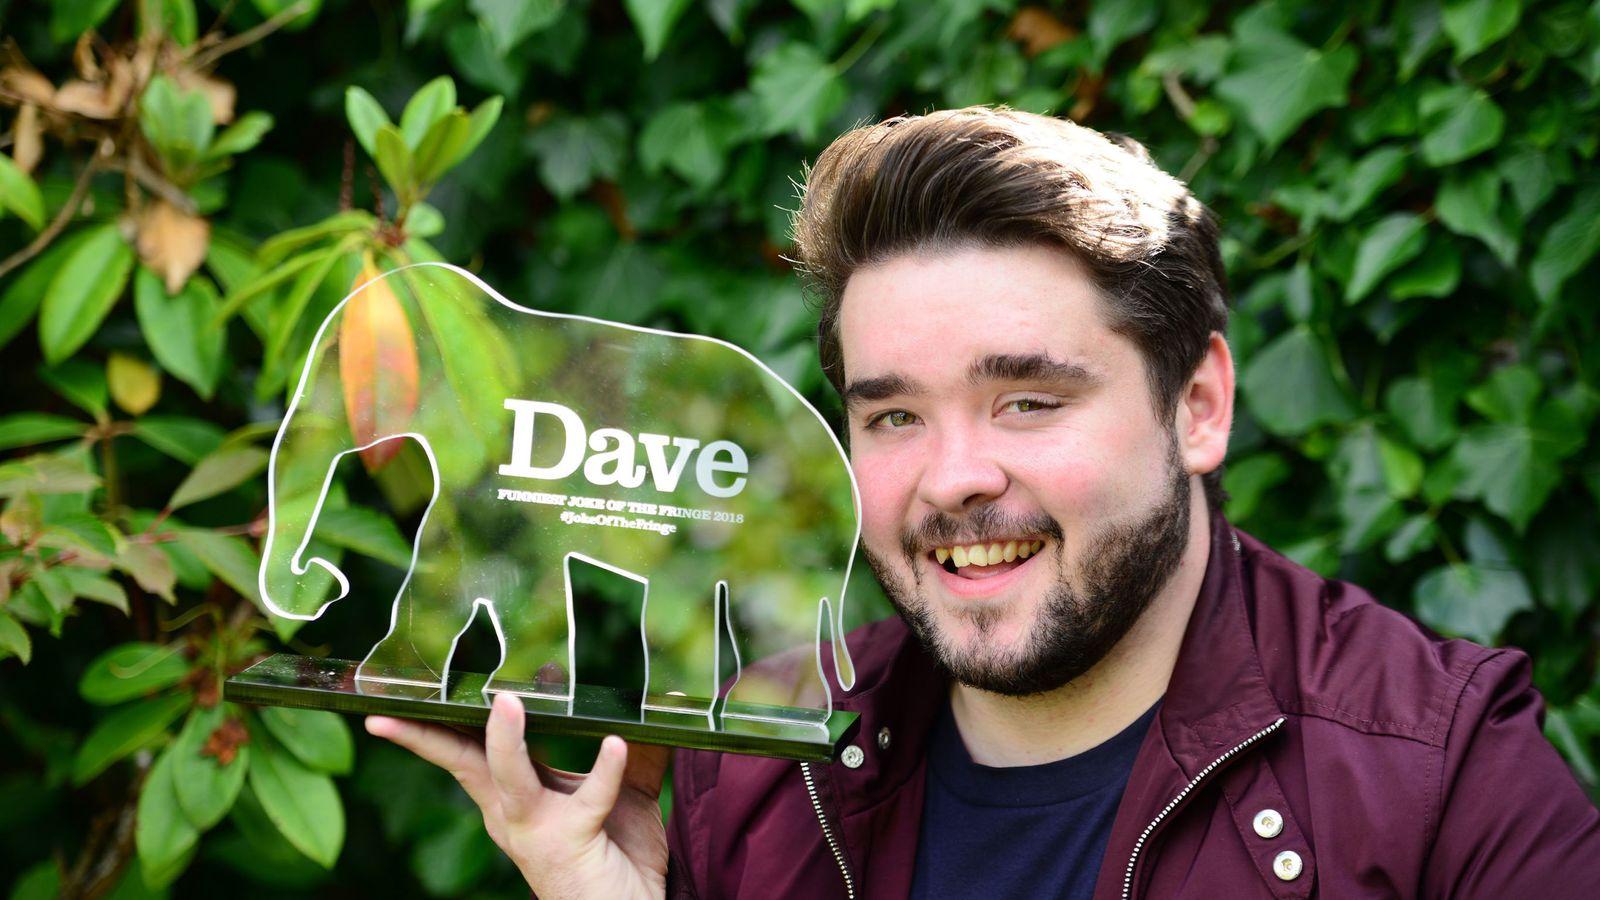 Top 10 best gags at Edinburgh Fringe revealed